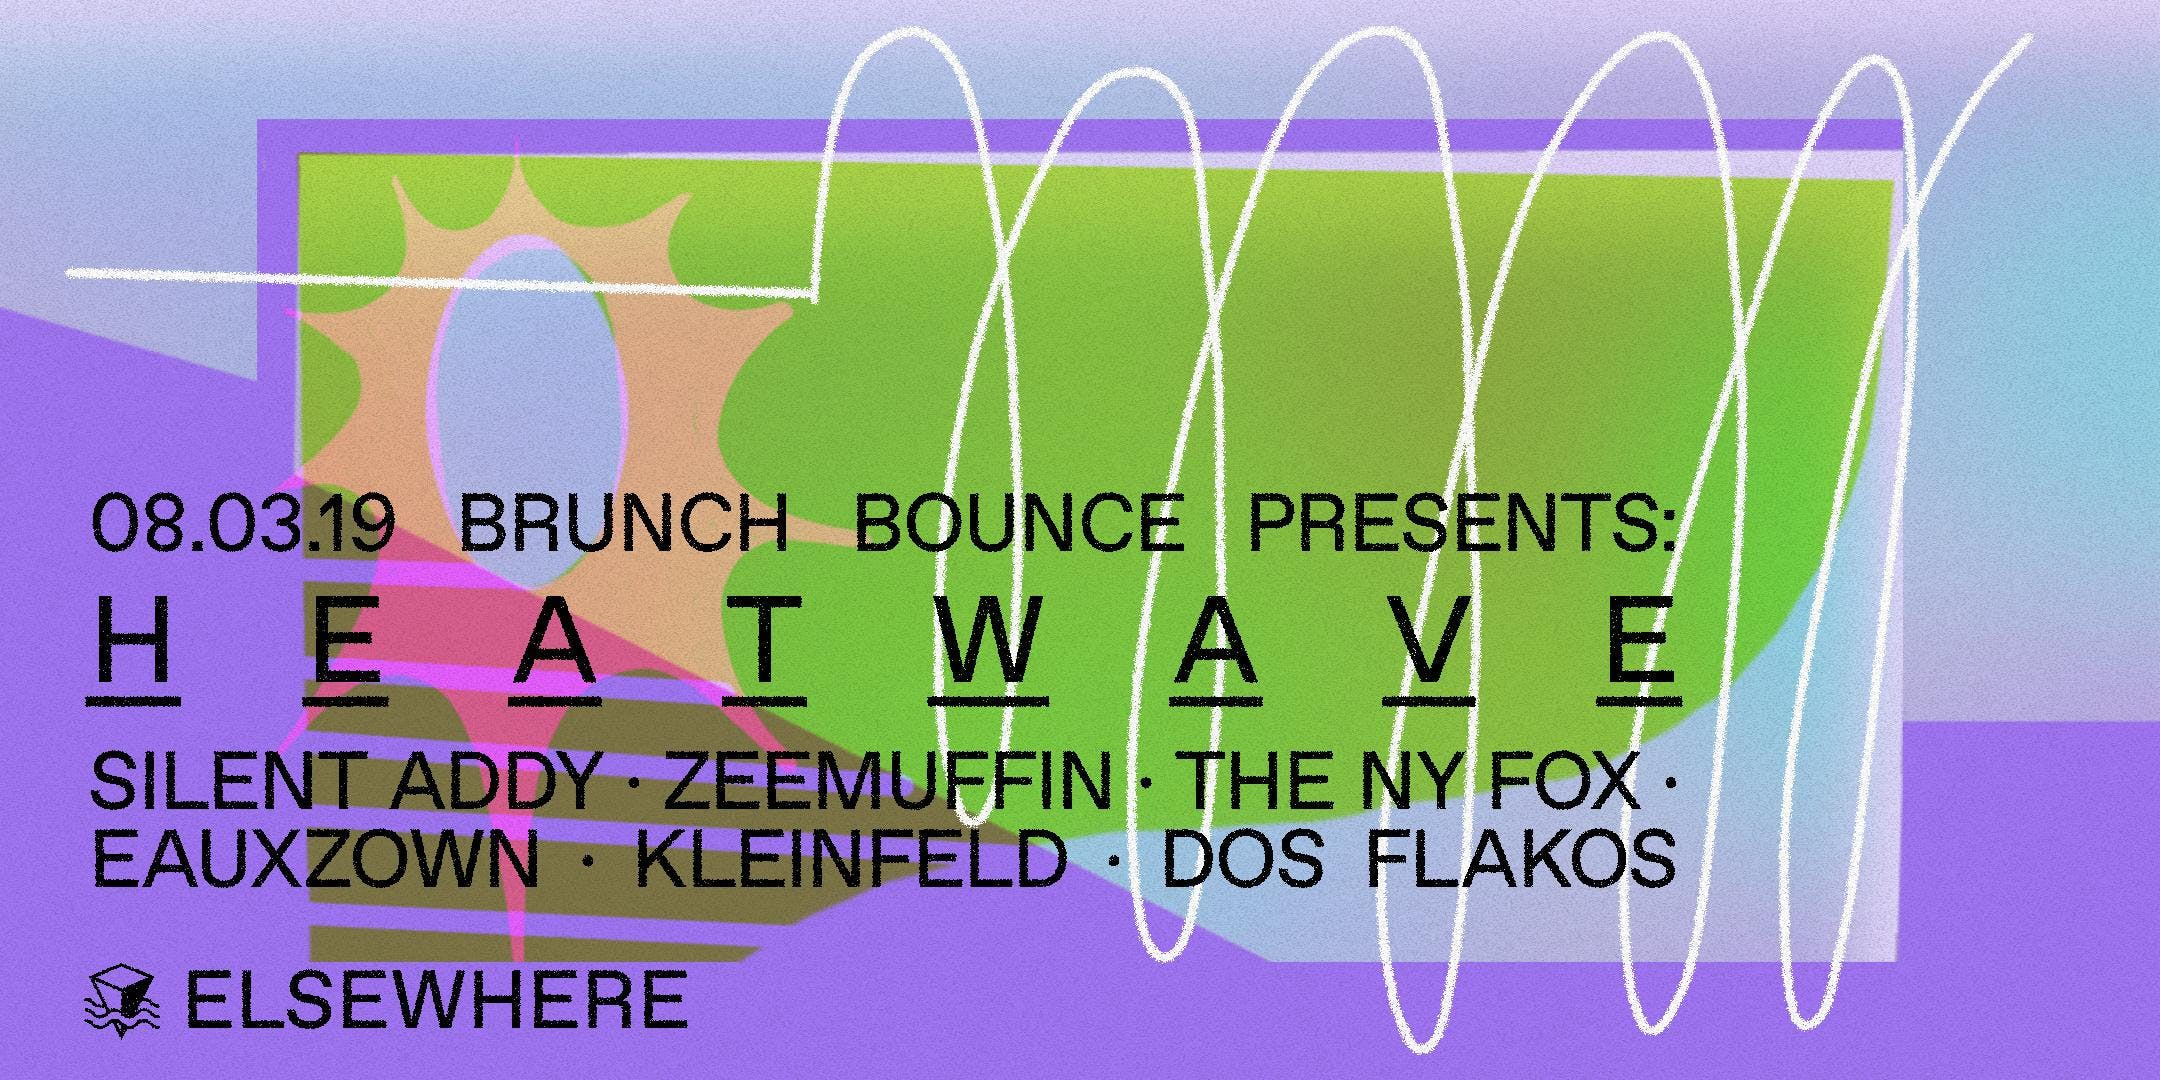 Brunch Bounce Presents: Heatwave w/ Silent Addy, Zeemuffin, The NY Fox, Eauxzown, Kleinfeld and Dos Flakos